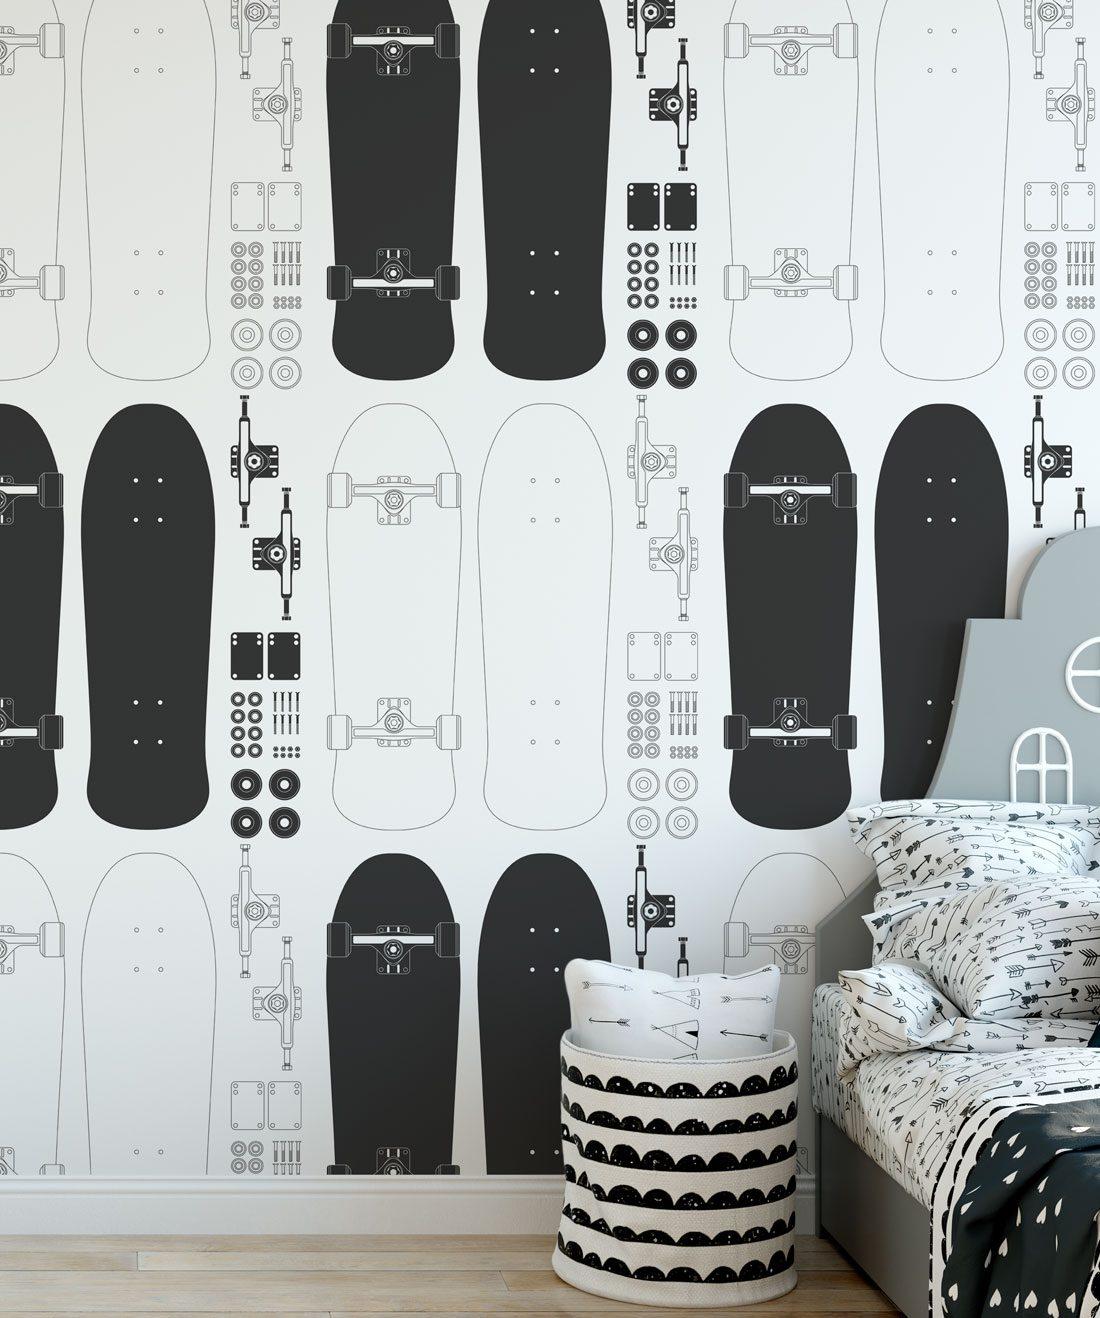 skateboard wallpaper • Skater wallpaper • X-Games Wallpaper • Teen Wallpaper • Milton & King USA